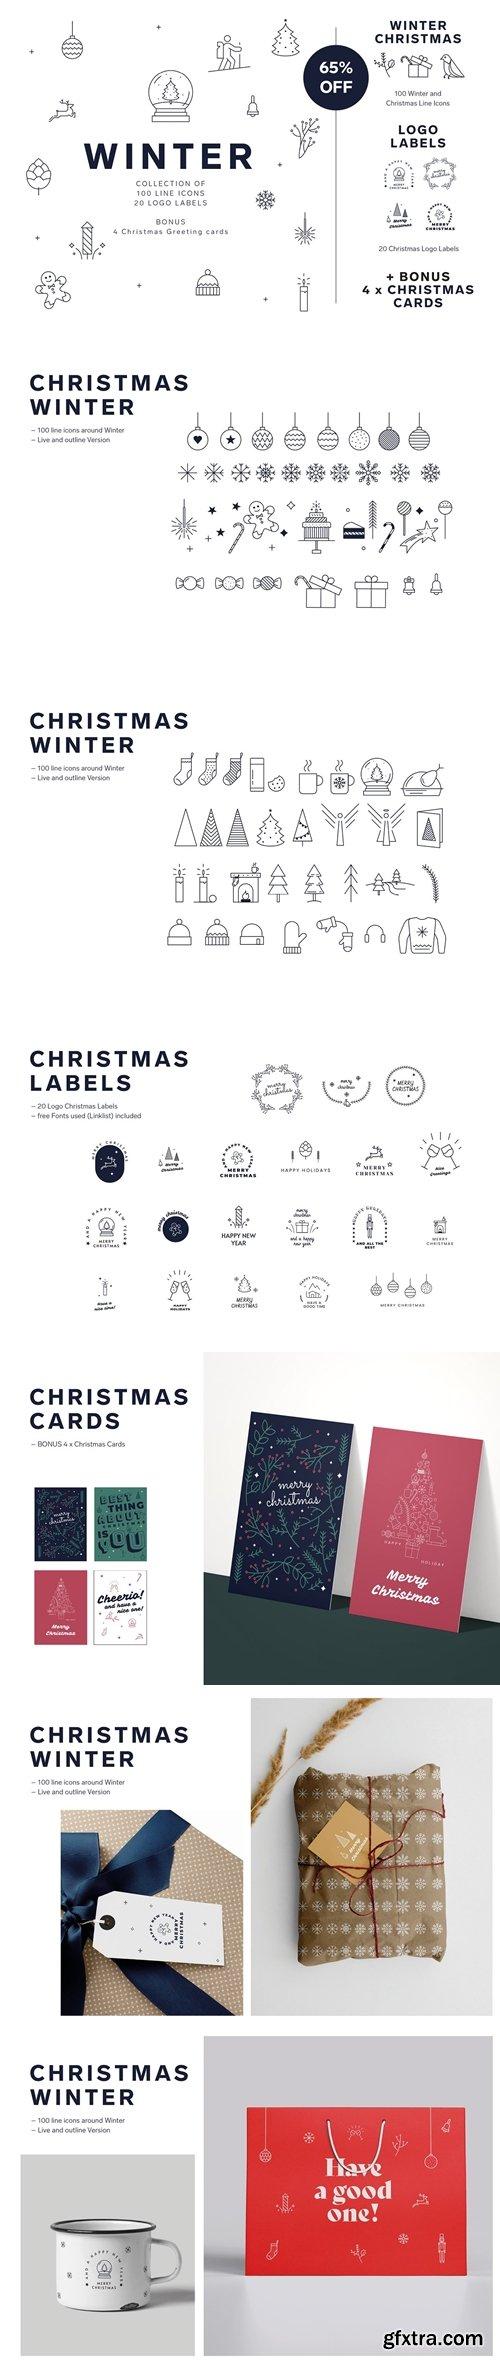 CreativeMarket - Christmas Winter Icon Set 5634282